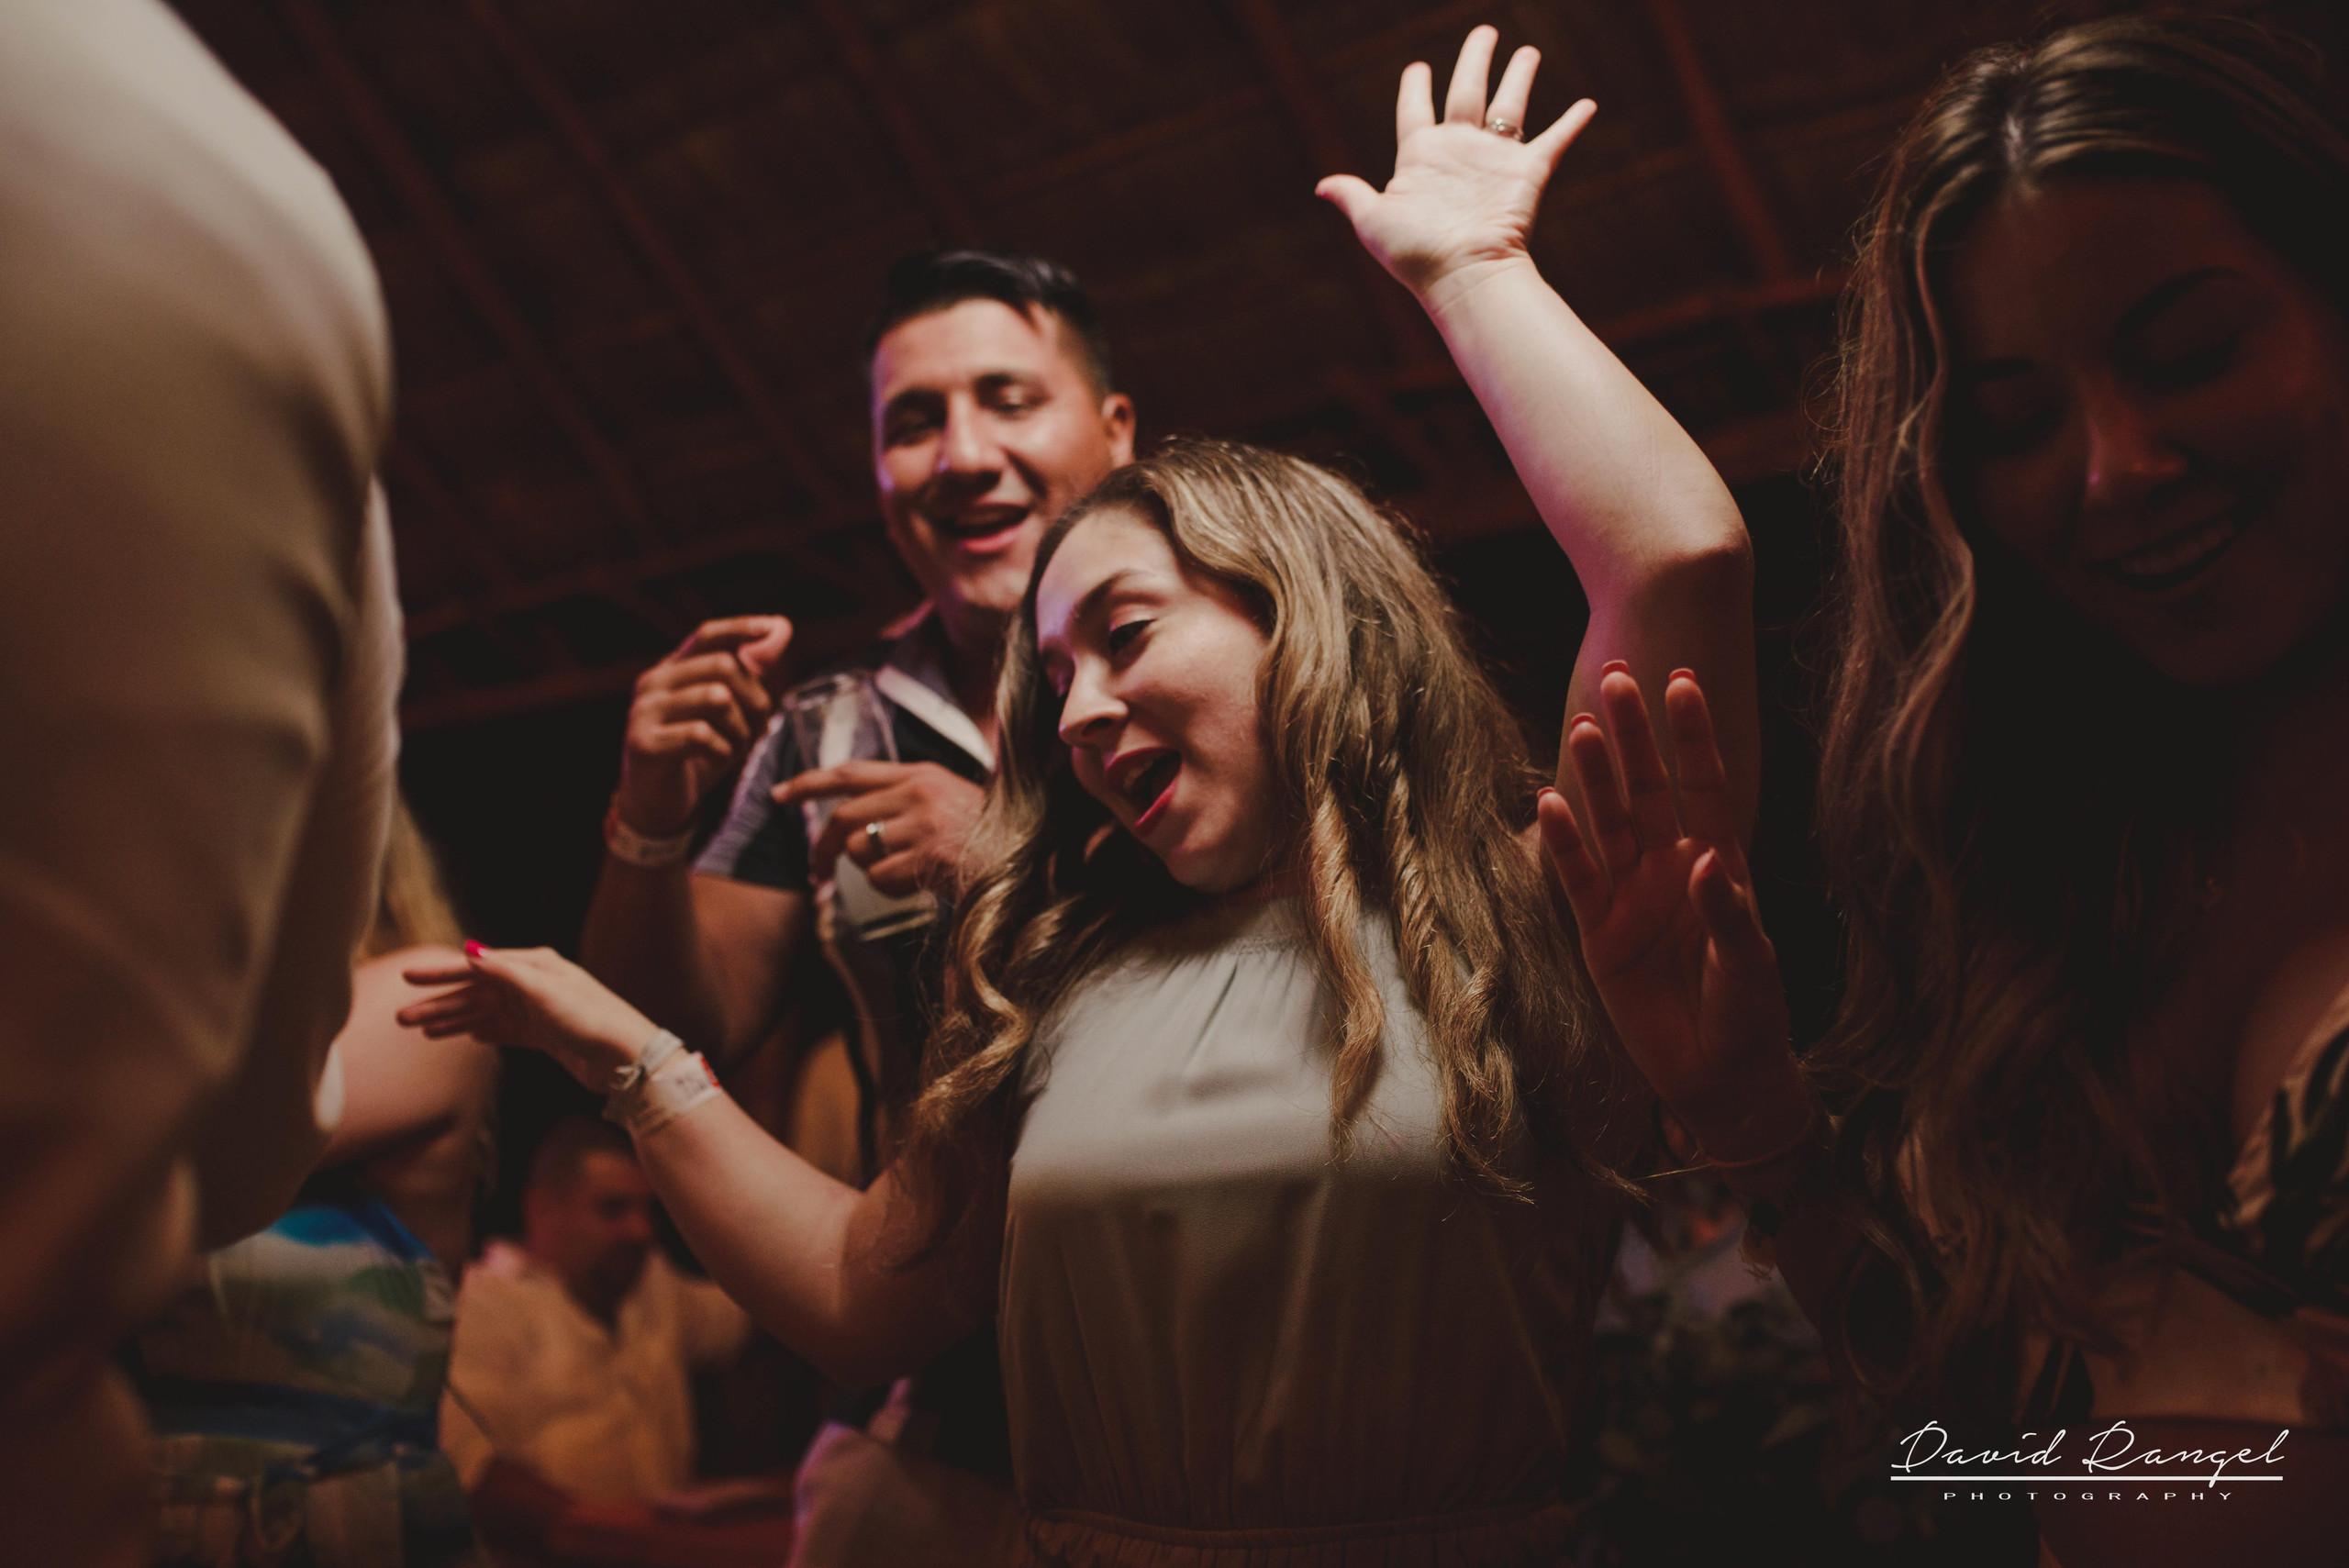 bride+groom+dance+reception+guest+celebration+happiness+photo+dance+floor+friends+family